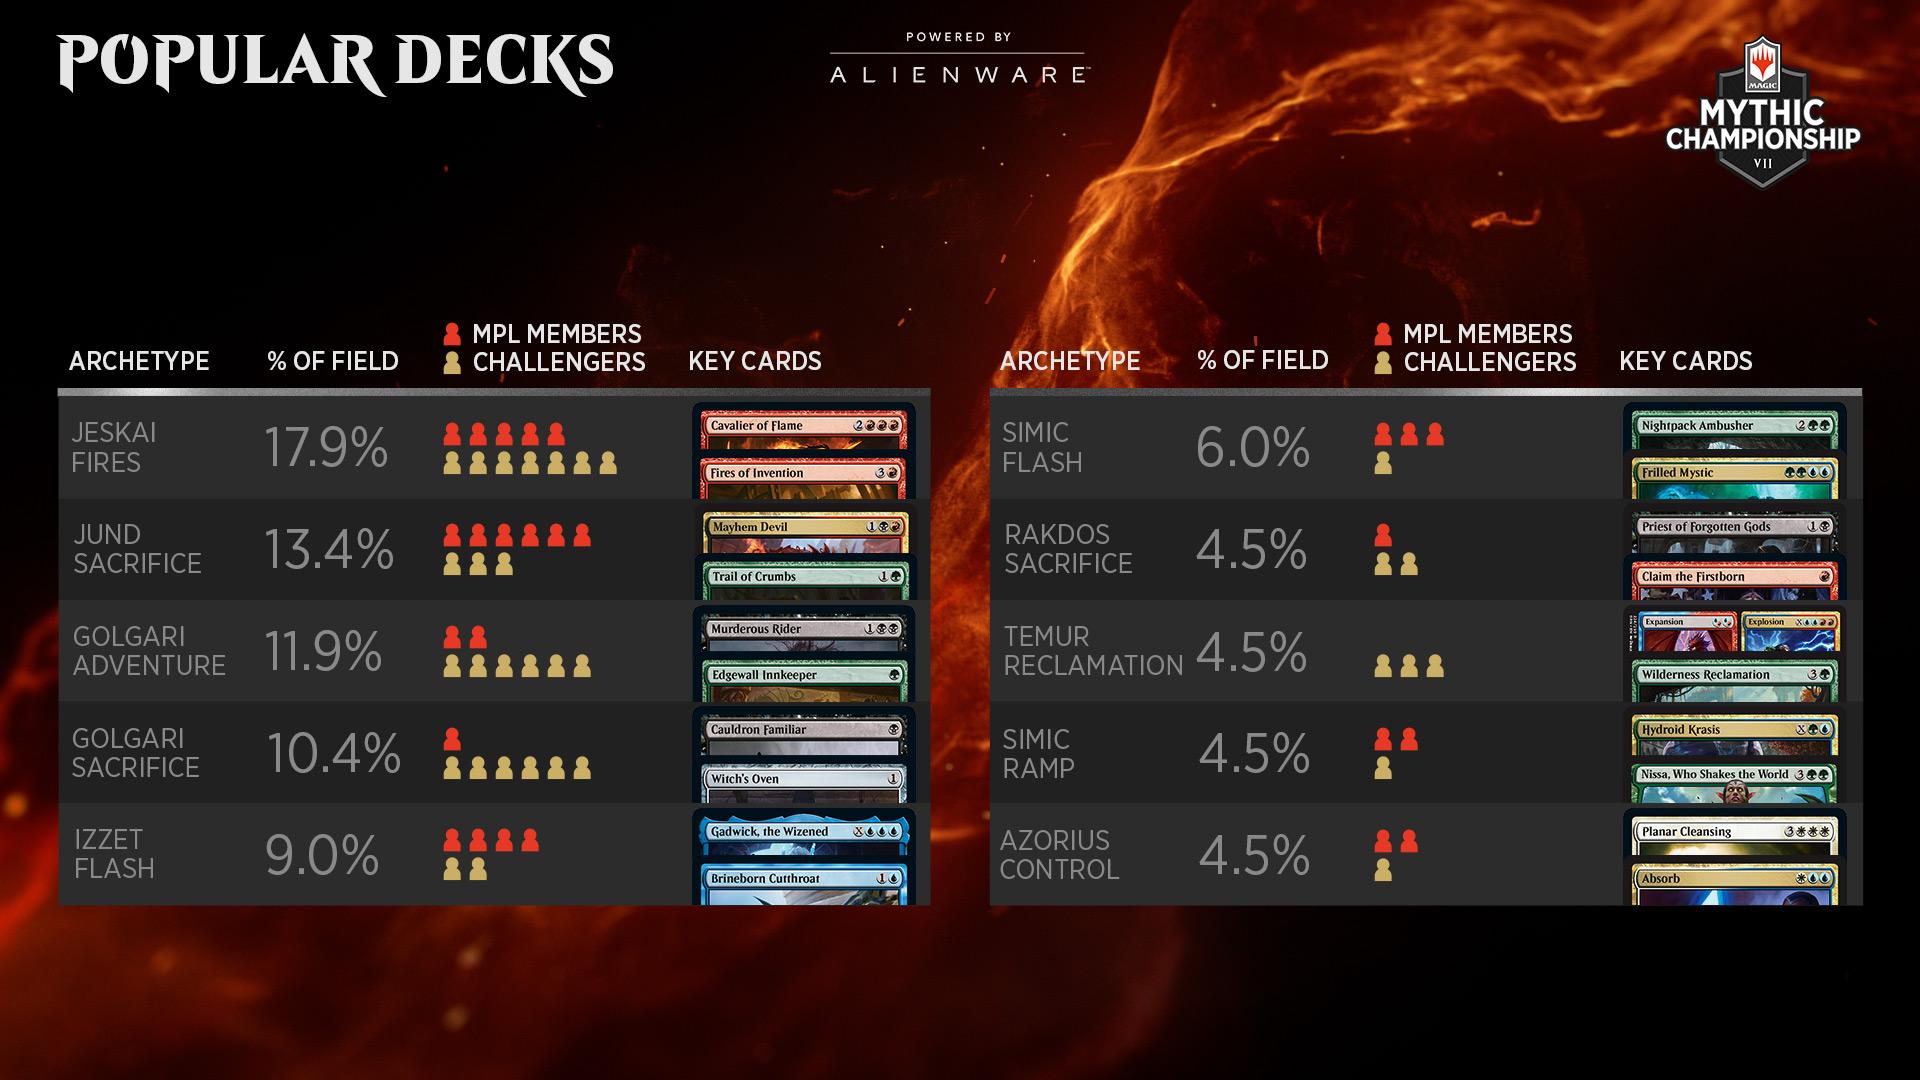 Mythic Championship VII day 1 metagame breakdown - popular decks